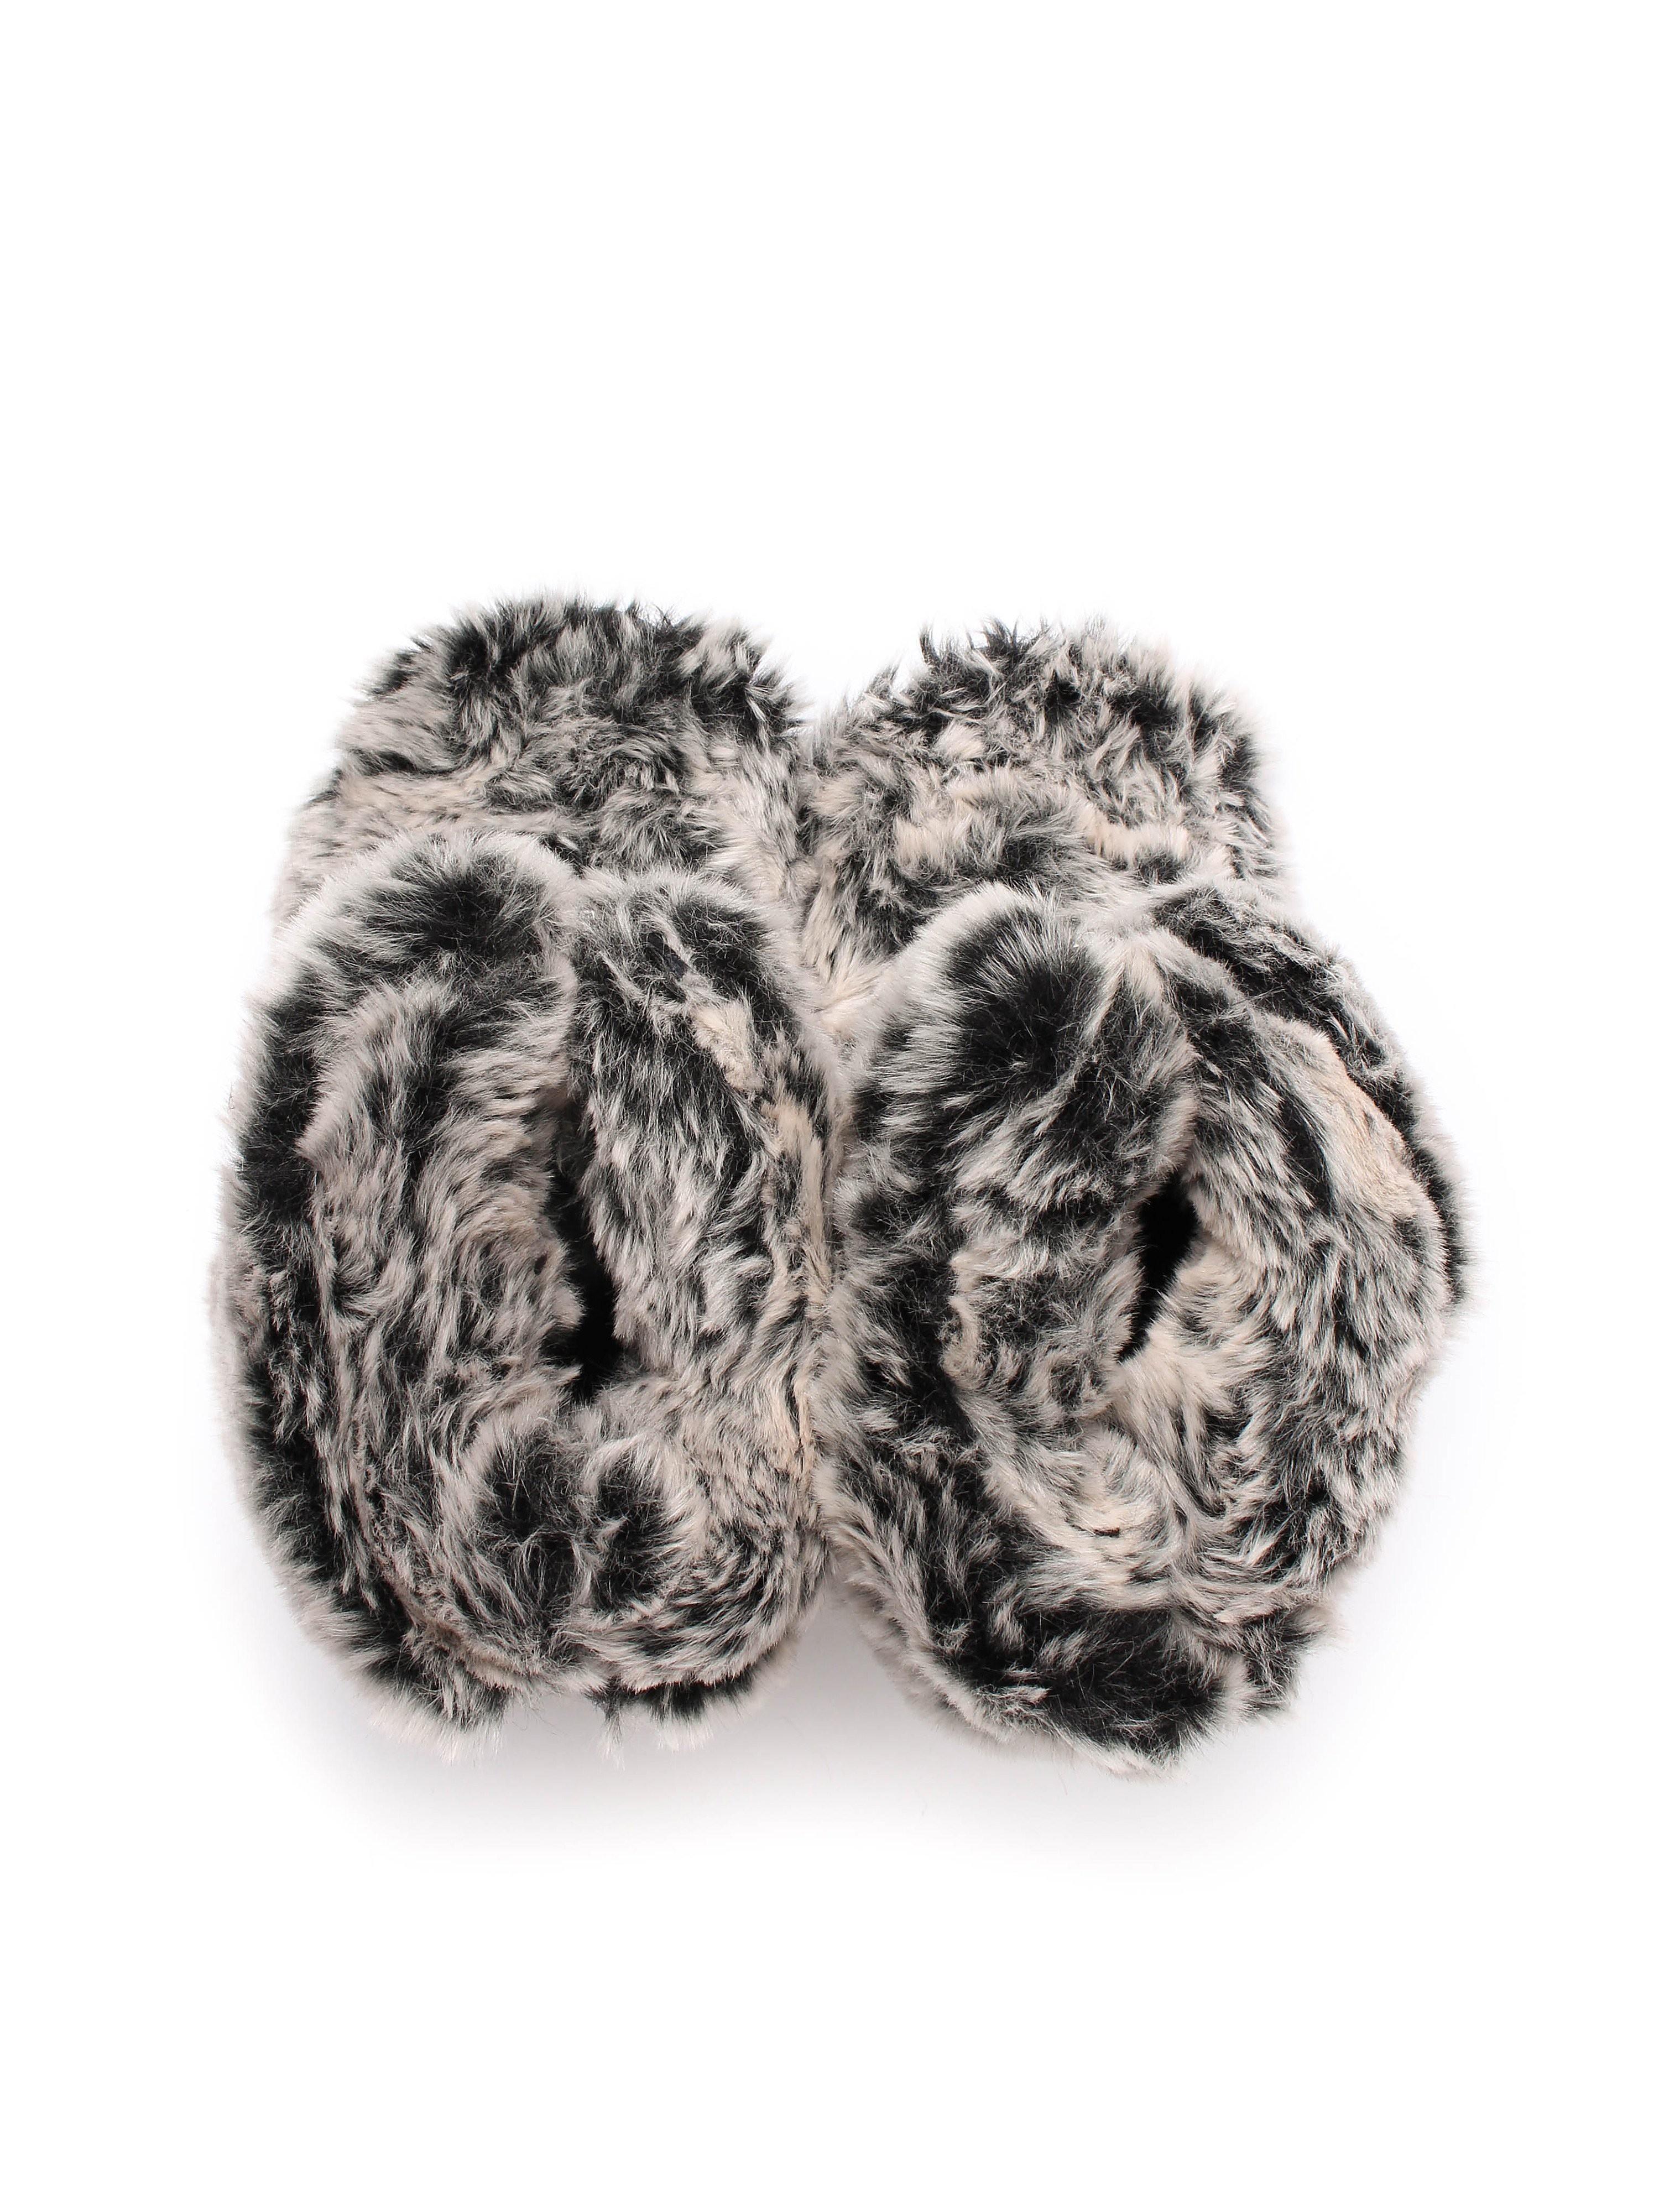 Bedroom Athletics Cole slippers - Possum